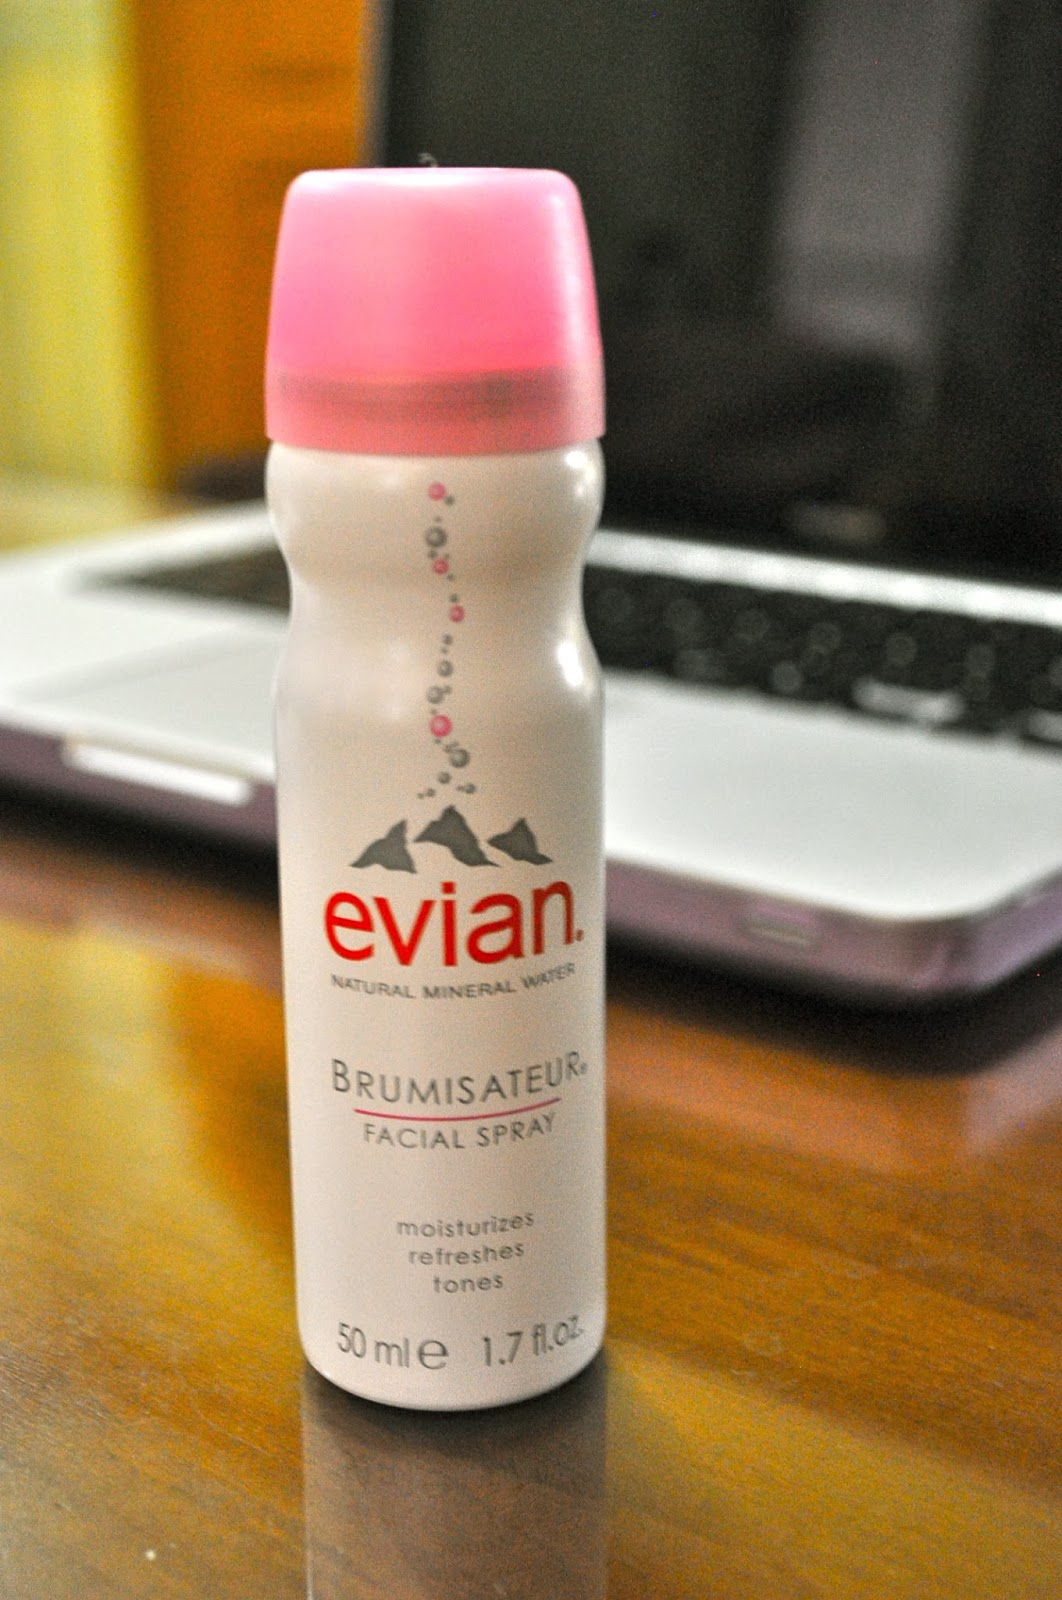 The Battle Of Mists Evian Vs Avene Beauty Reviews Facial Spray 300ml Brumisateur